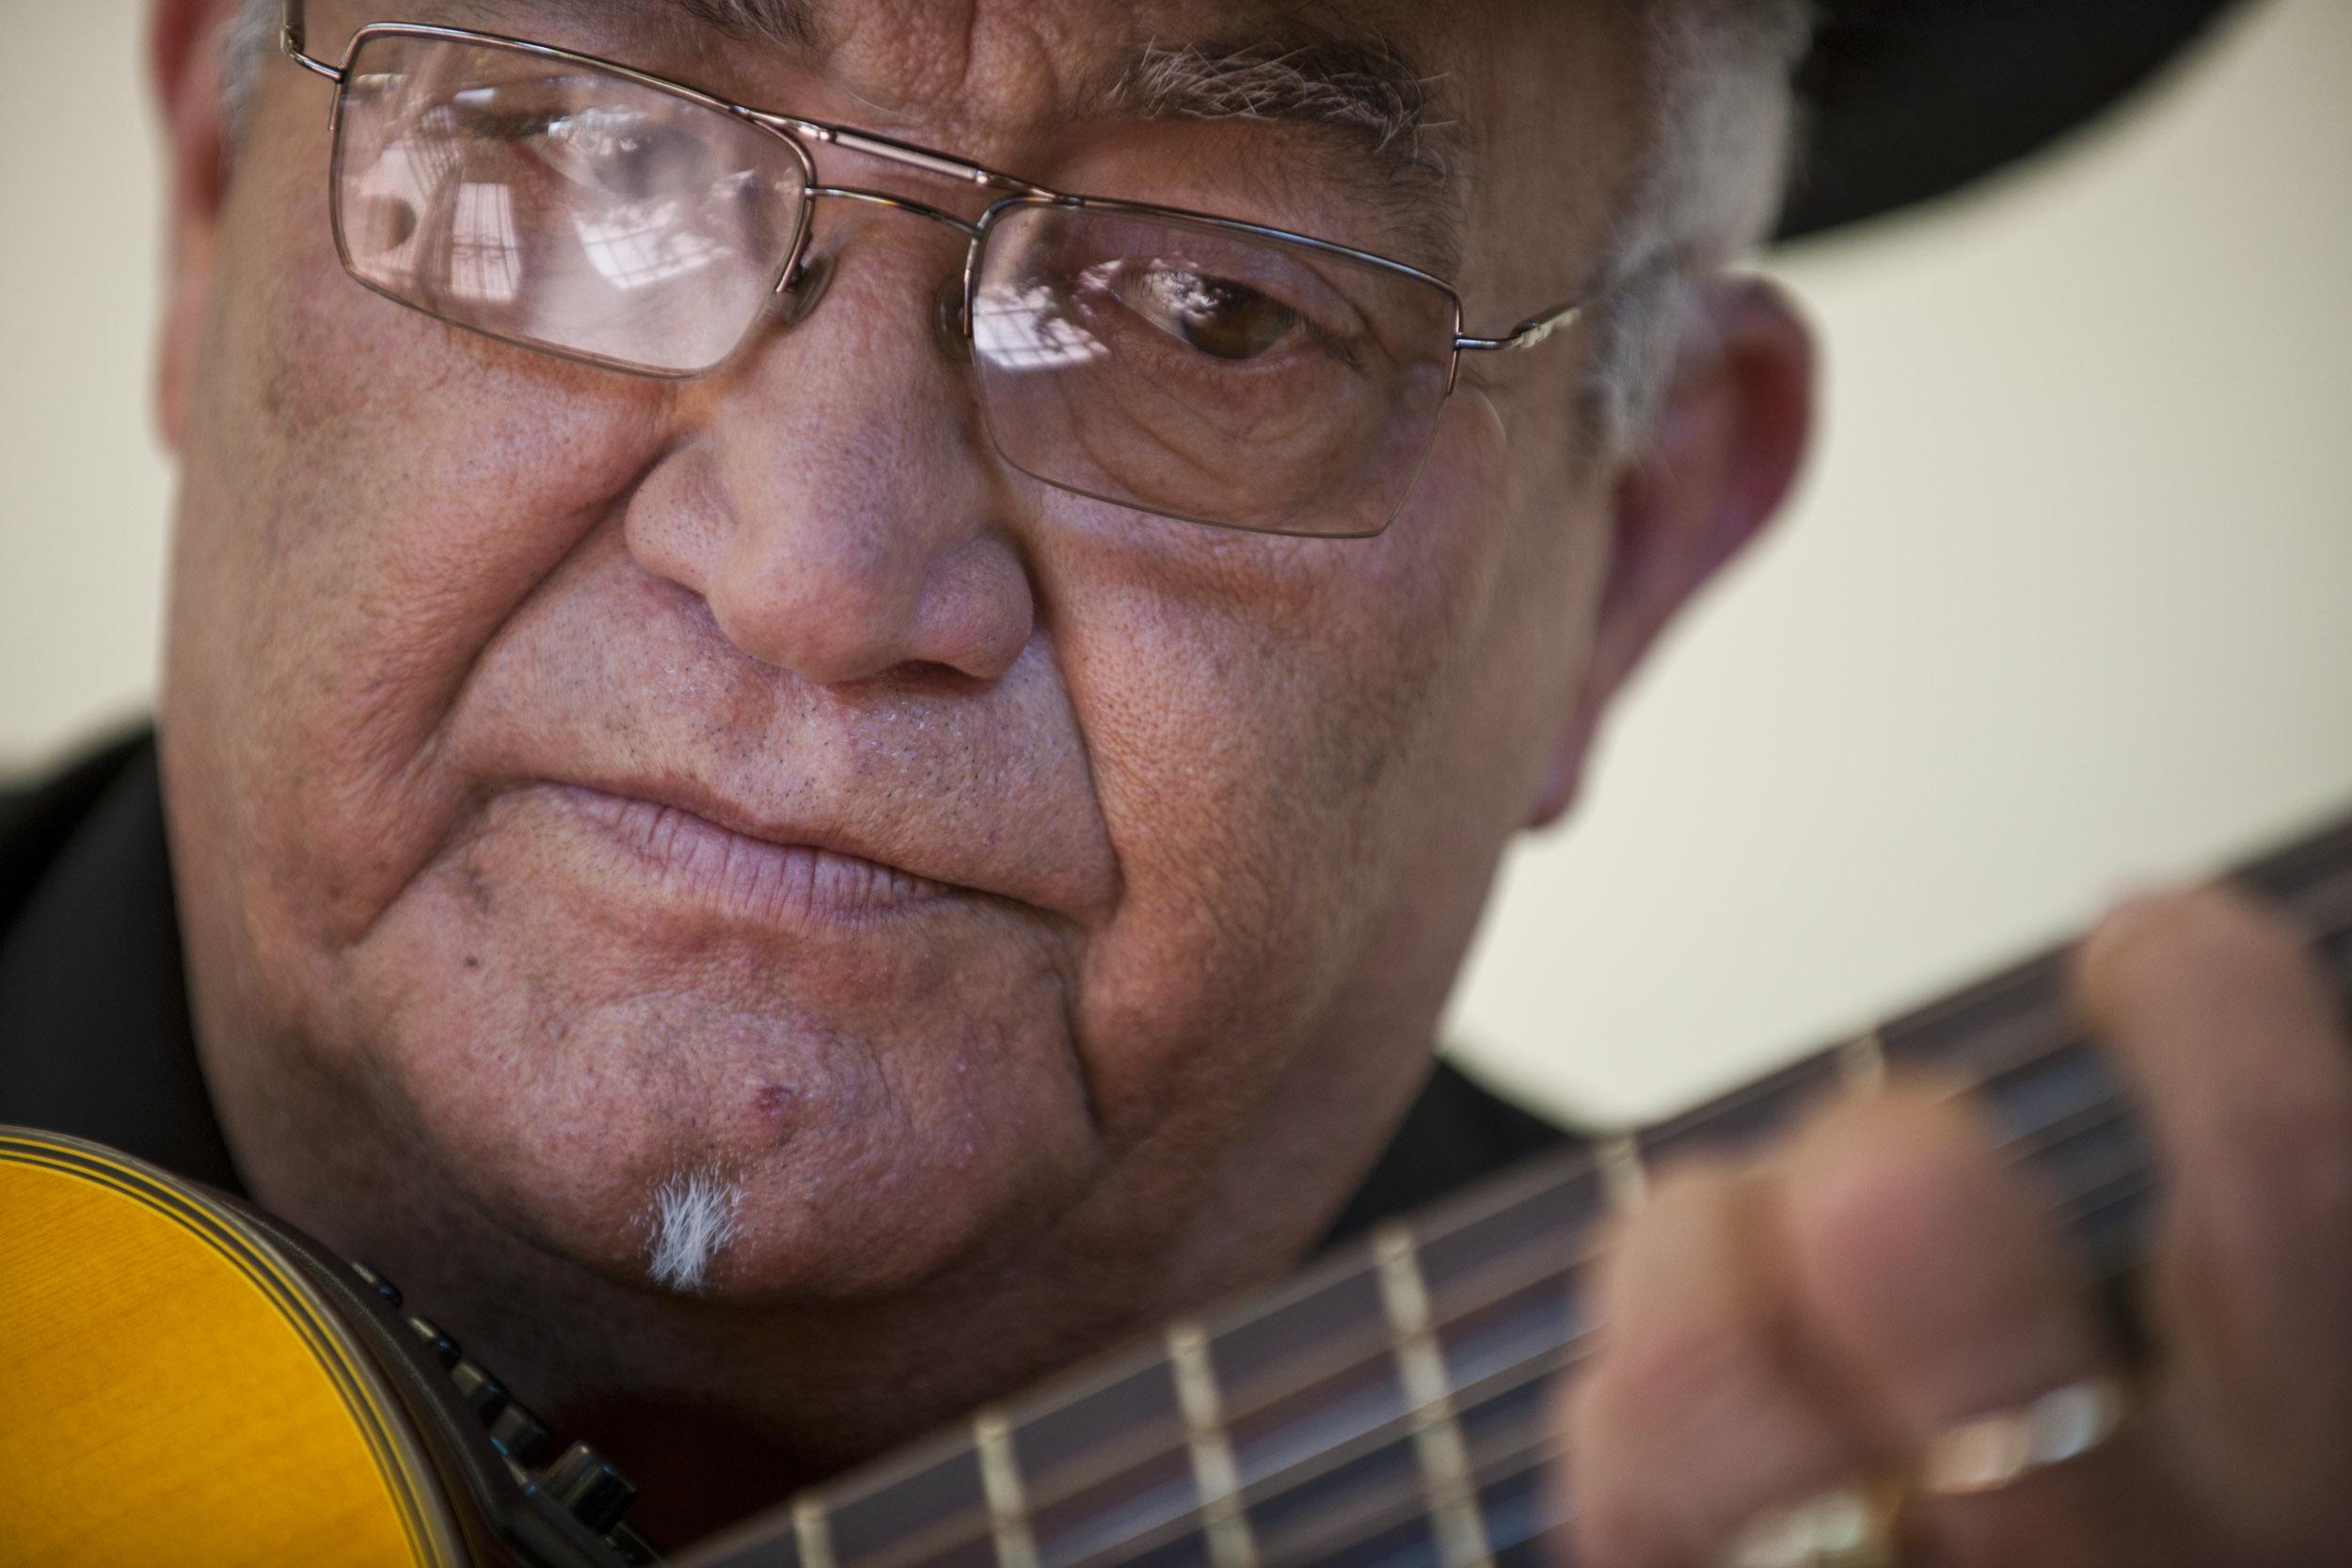 Eliades Ochoa, musician - Illuminated Cuba - Hector Garrido, Aerial and human photography